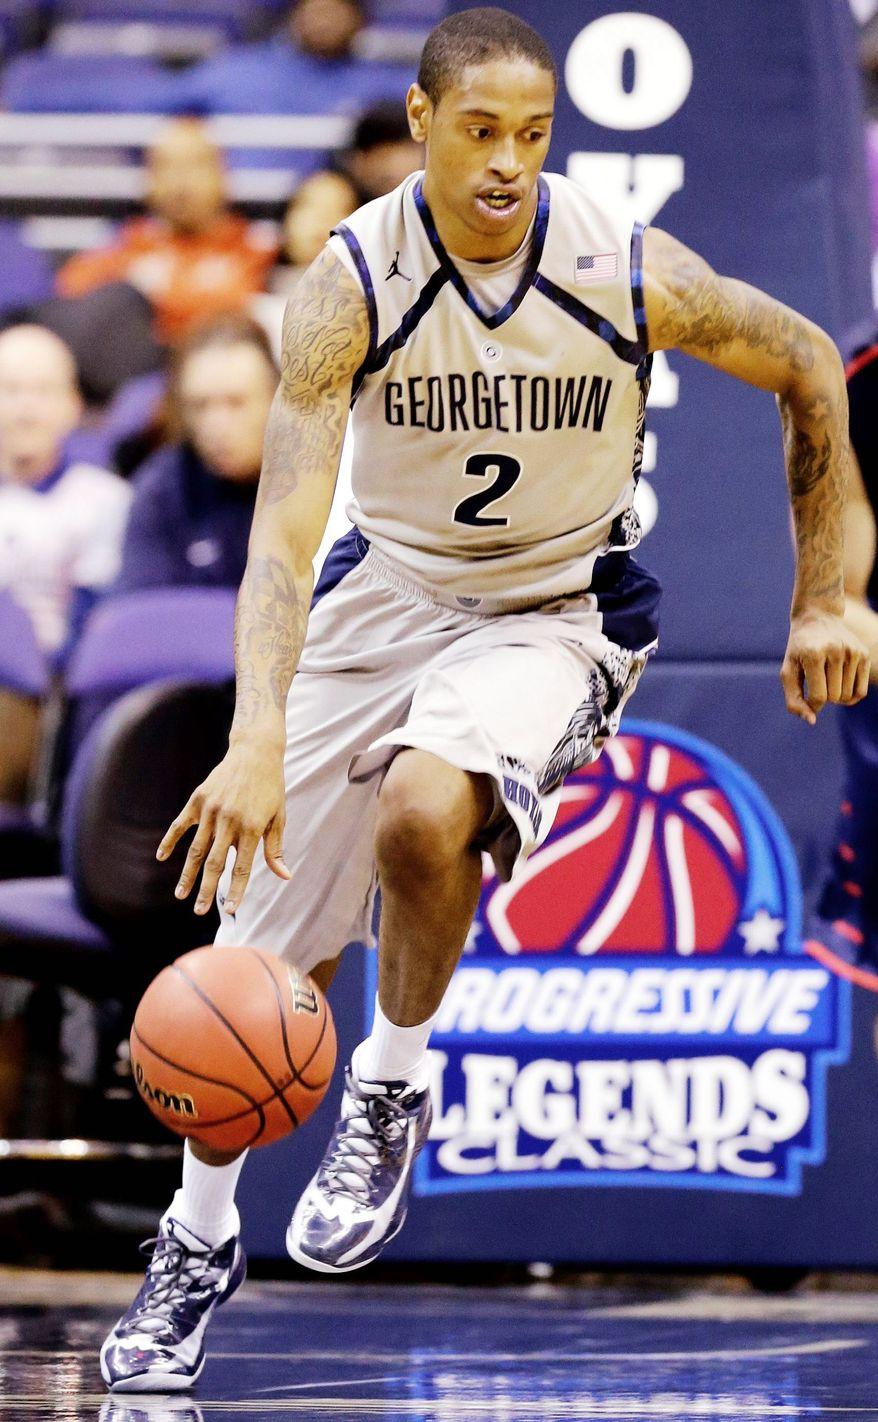 Georgetown forward Greg Whittington, left, dribbles the ball as he pursued by Liberty forward JR Coronado during the second half of an NCAA college basketball game on Wednesday, Nov. 14, 2012, in Washington. Georgetown won 68-59. (AP Photo/Alex Brandon)